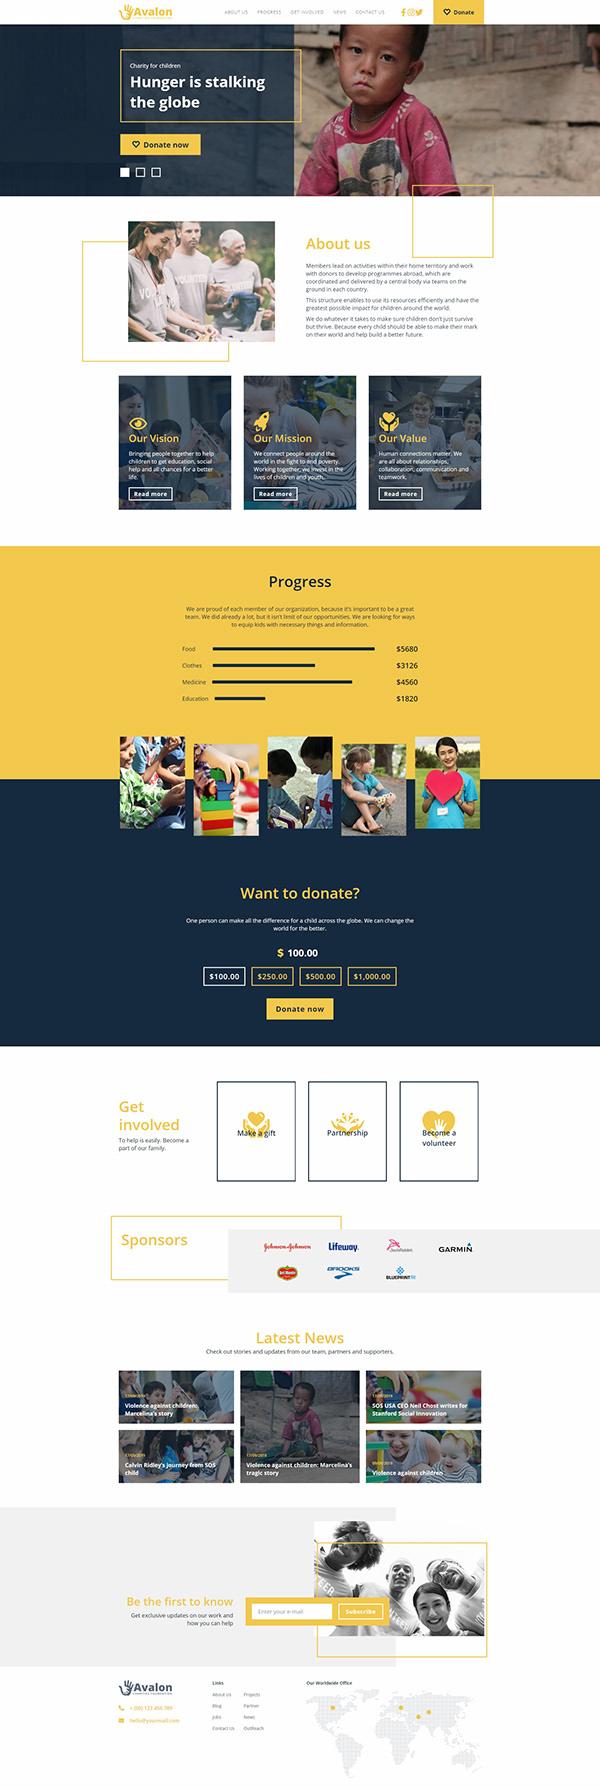 Avalon - A Charity Website